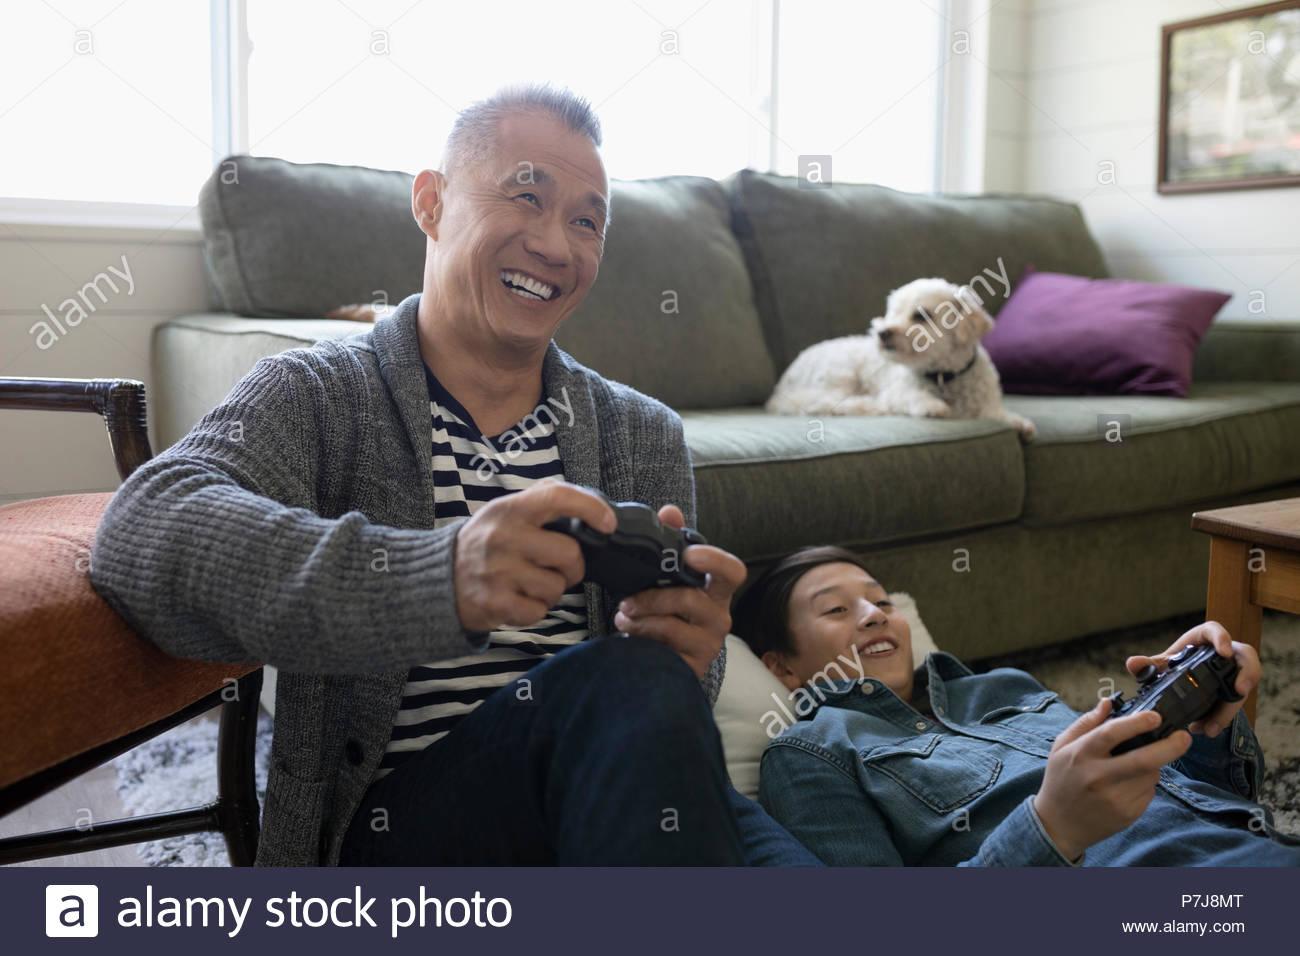 Viendo perro feliz, padre e hijo, tocando en la sala de videojuegos Imagen De Stock